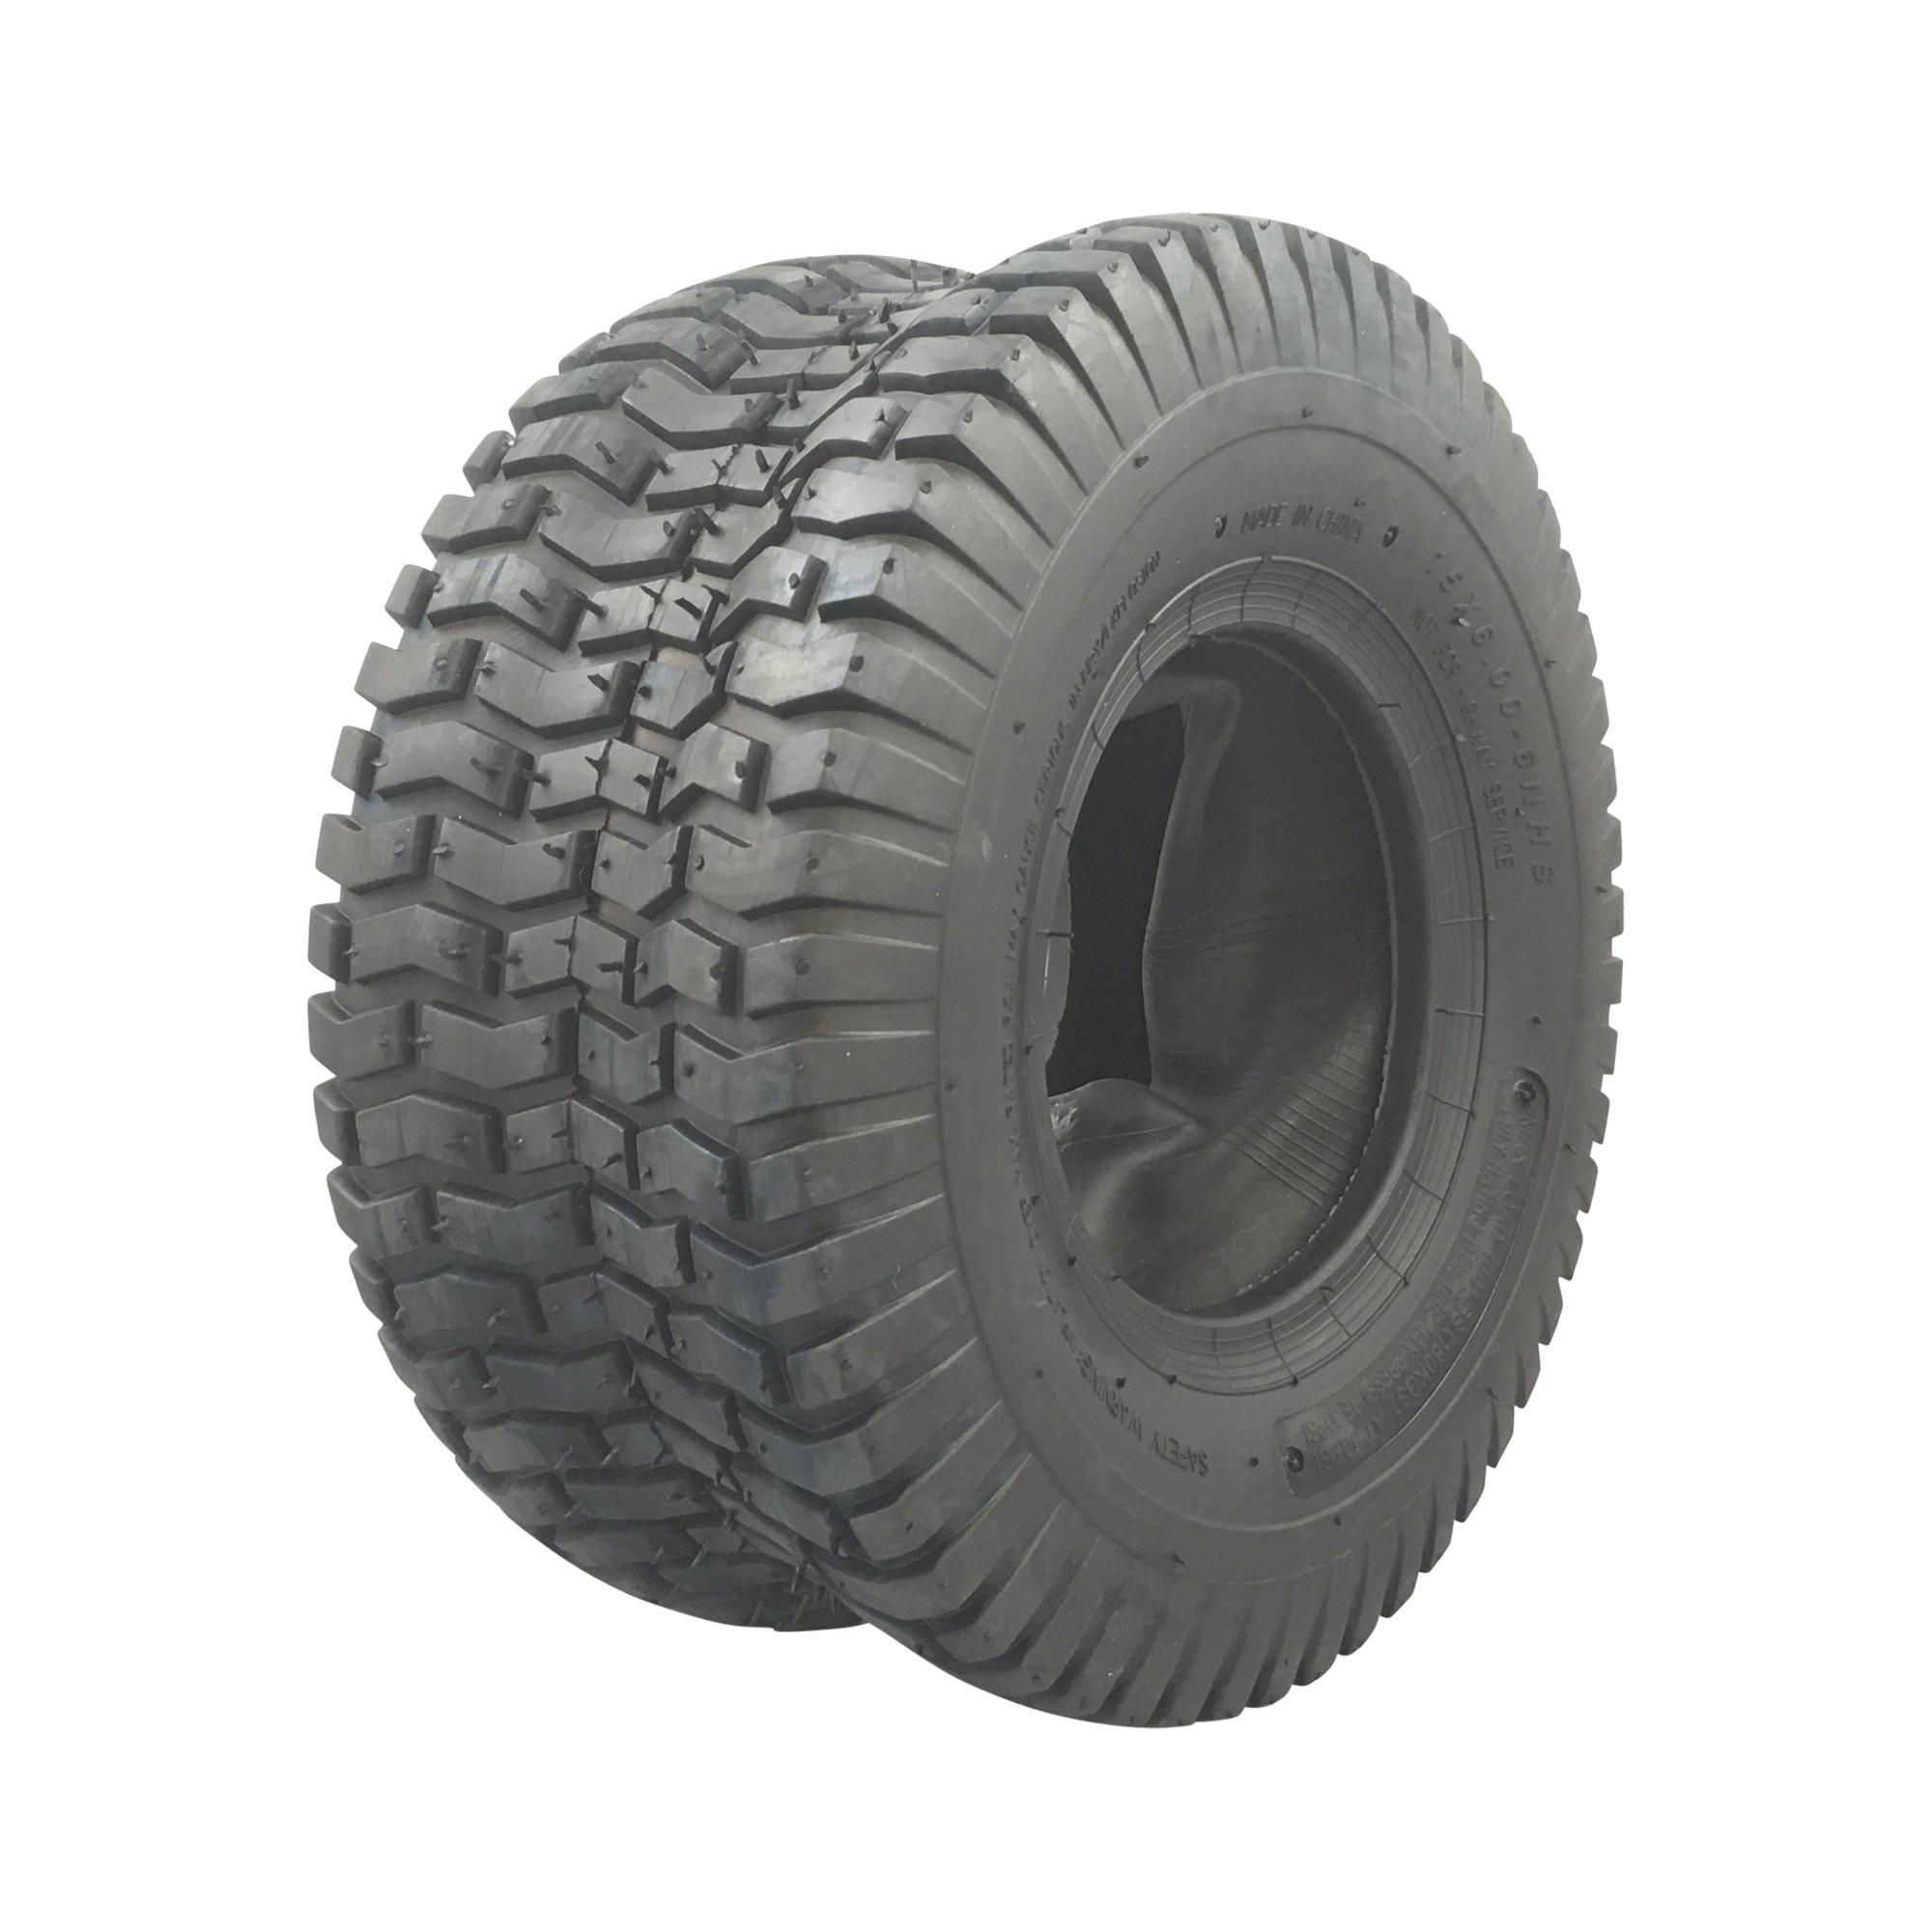 MARASTAR 21412 15x6.00-6 Tire Only with Tube Turf Saver Tread